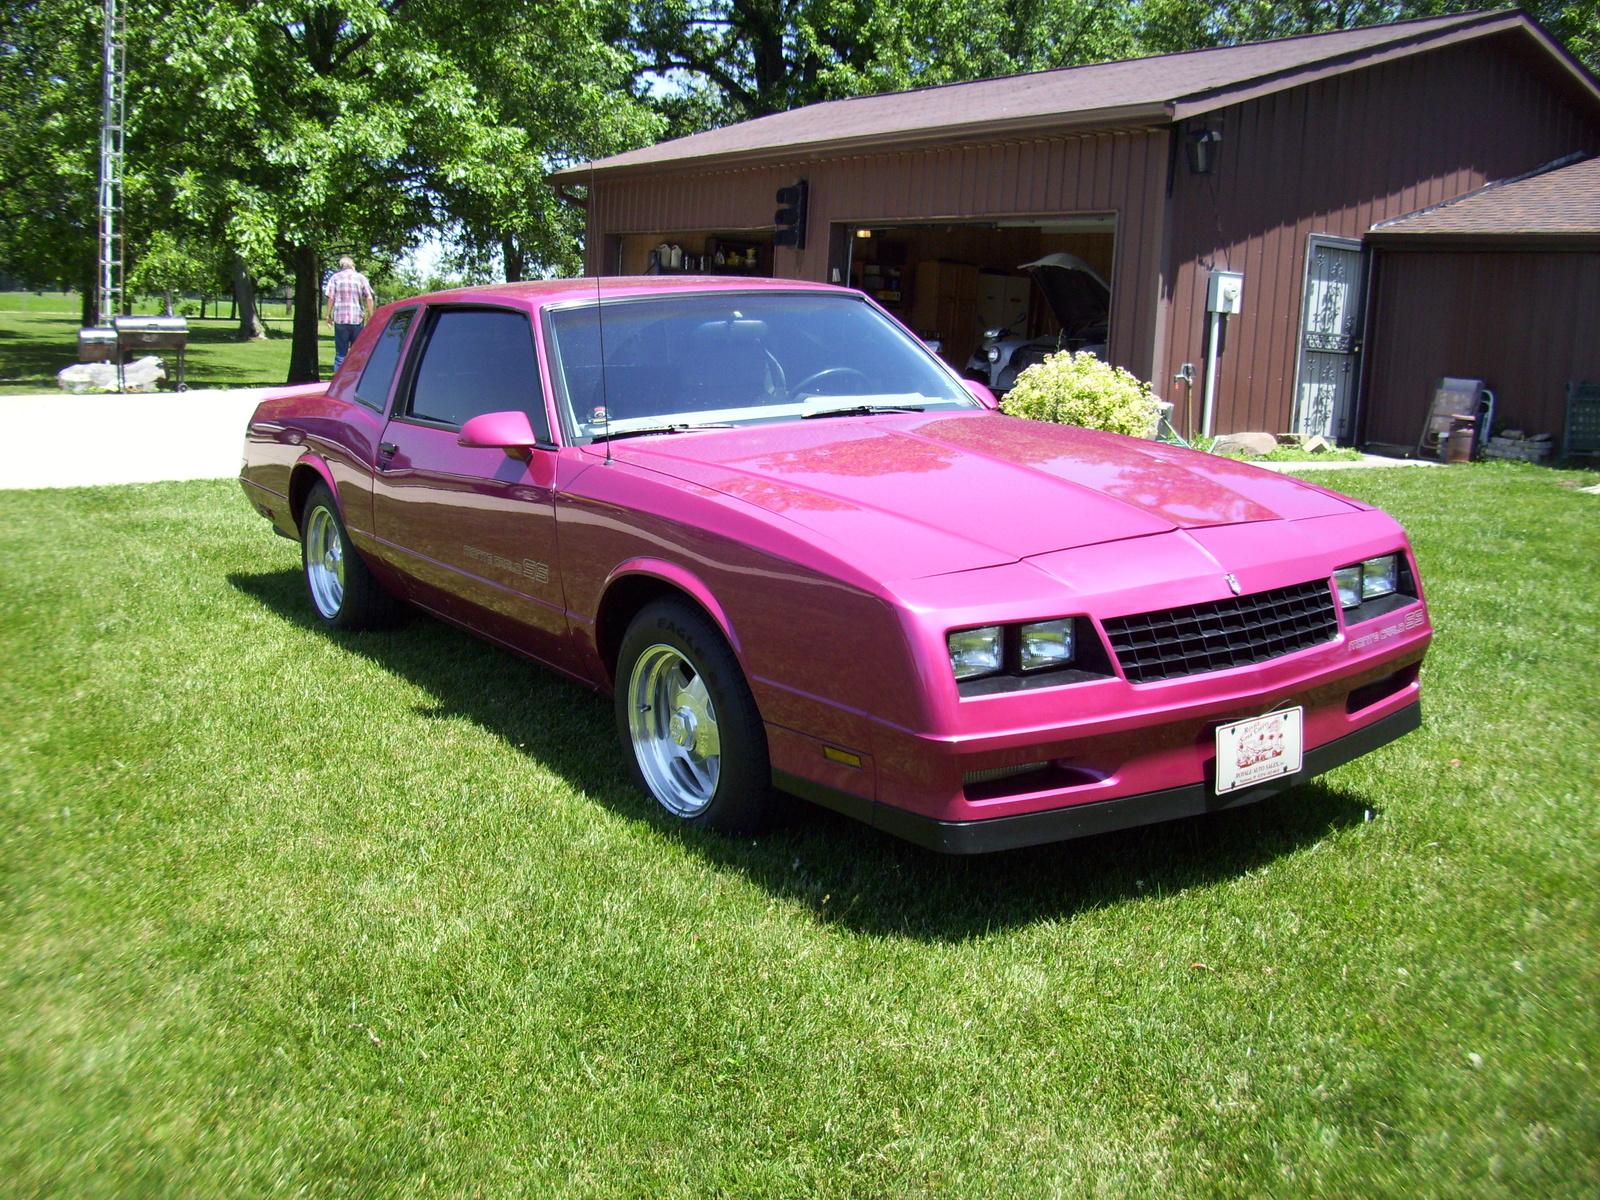 1986 Chevrolet Monte Carlo - Overview